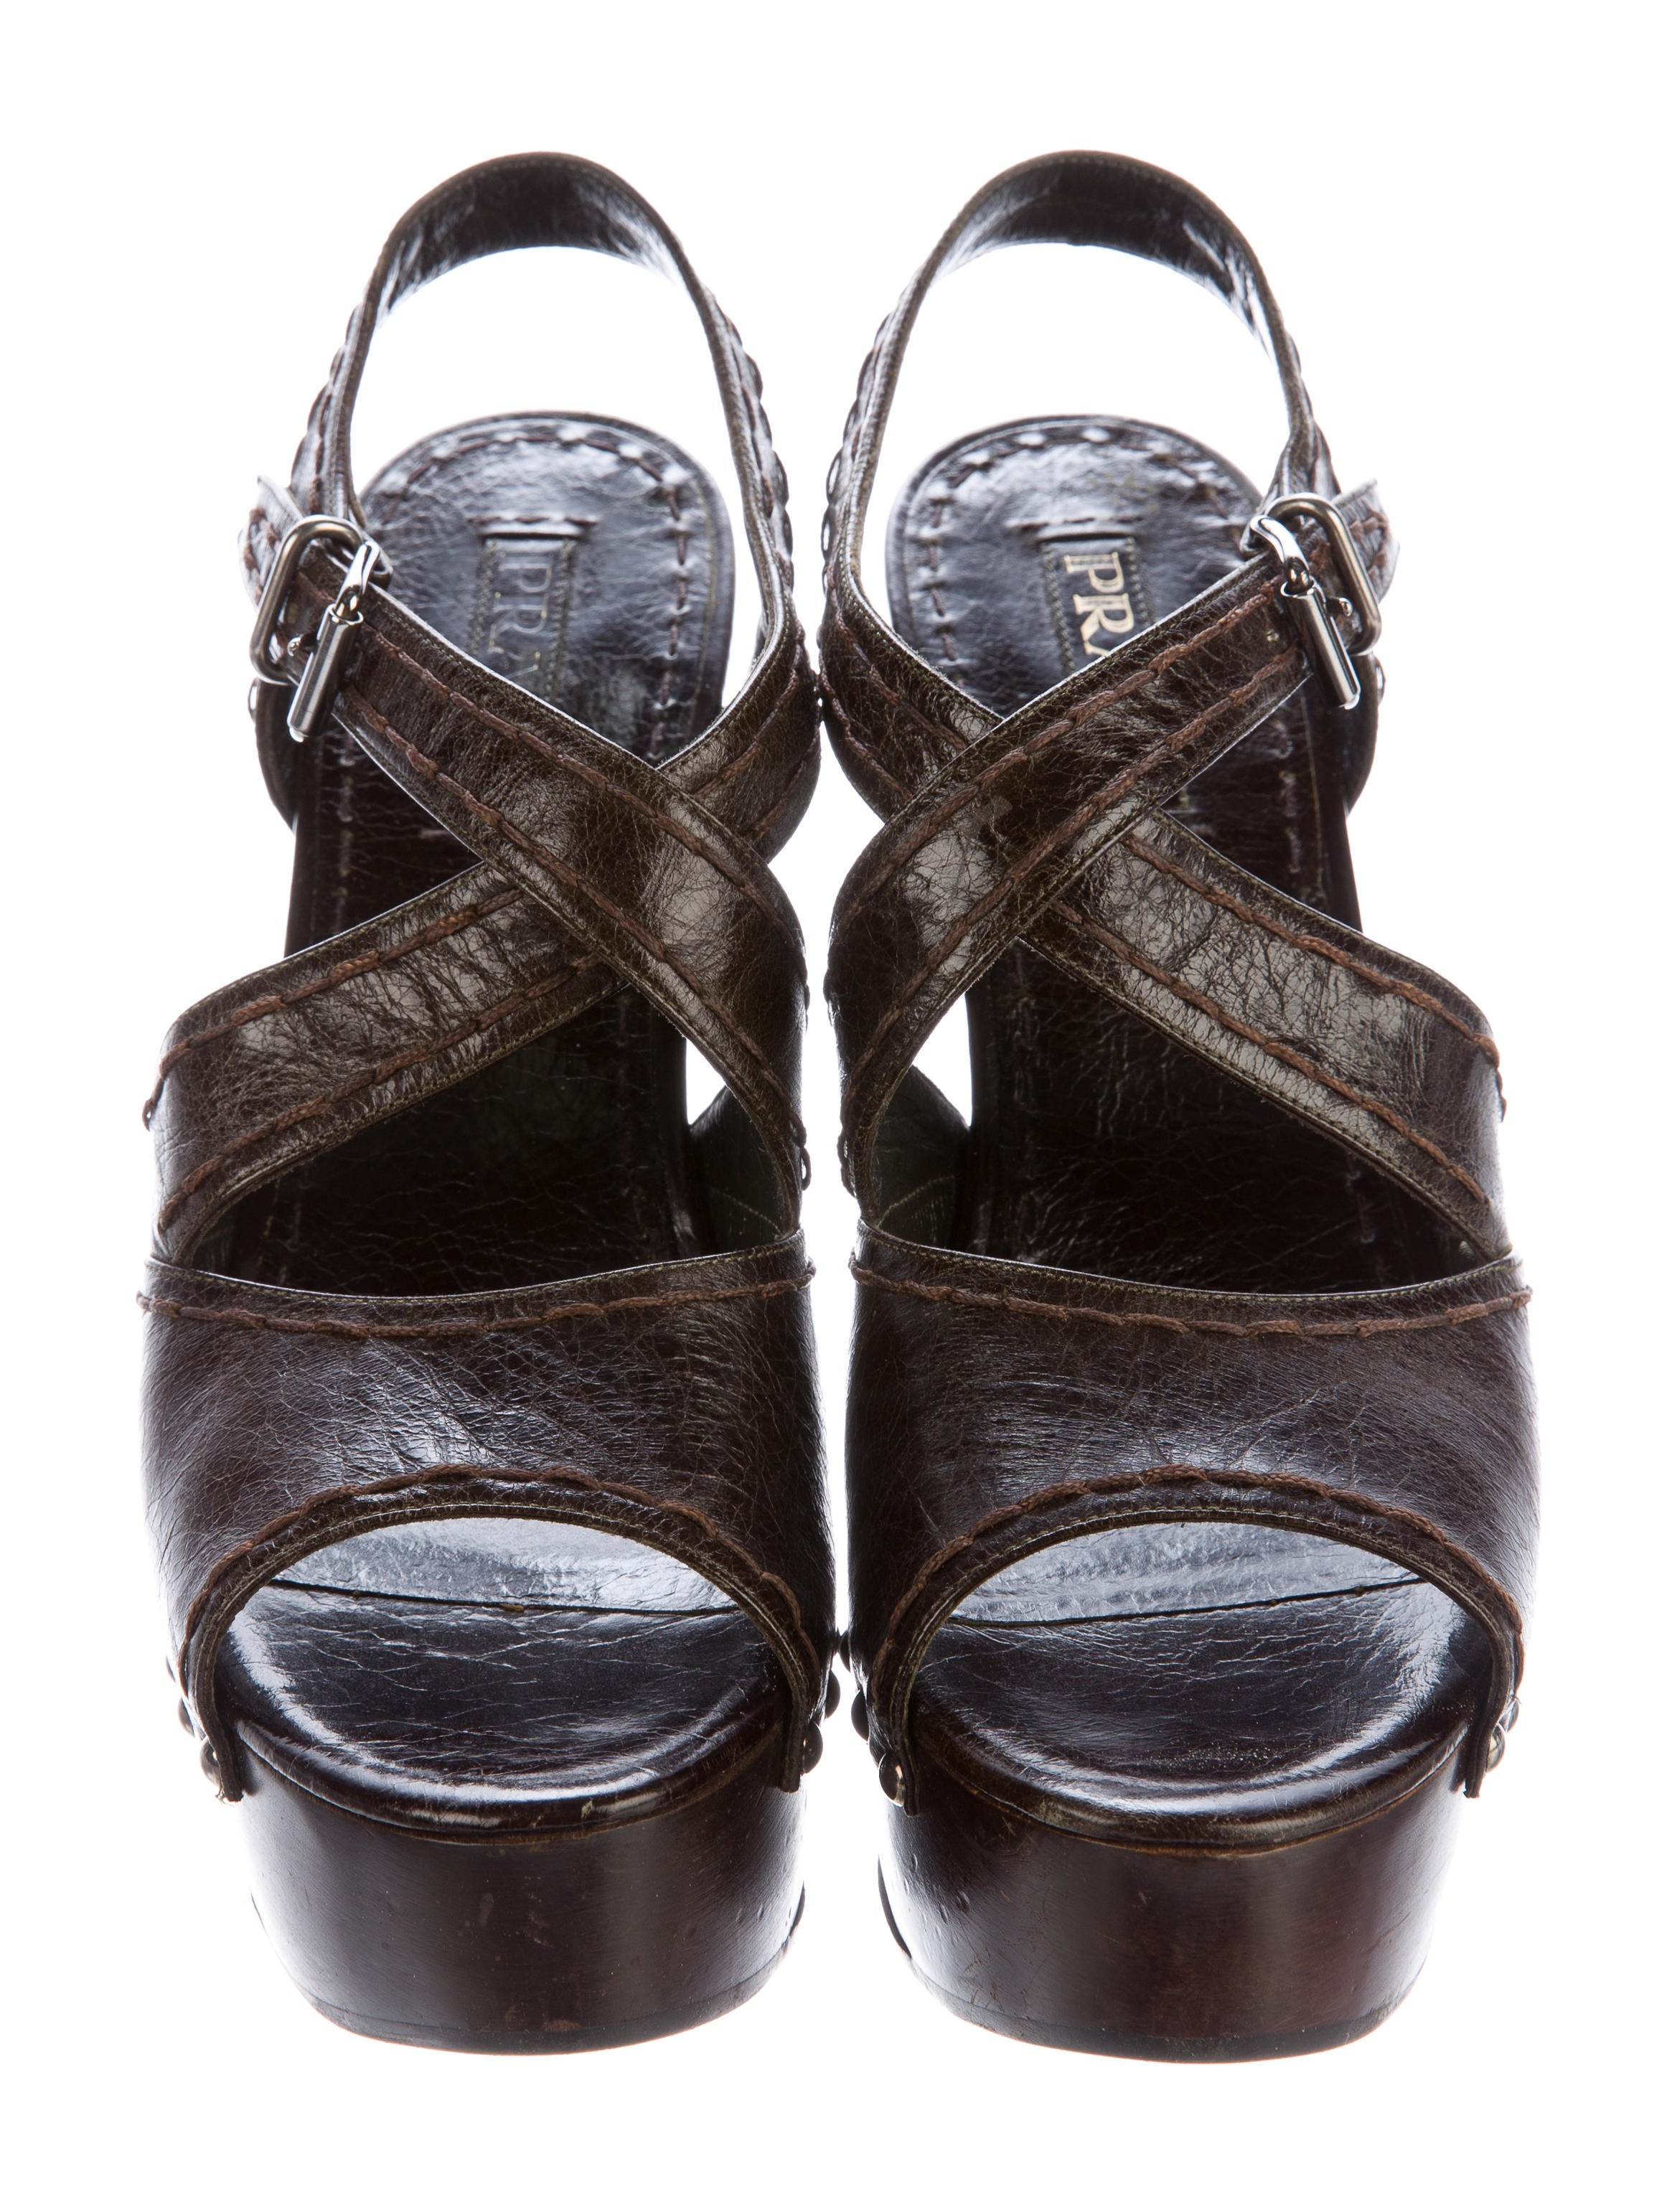 Prada Leather Platform Sandals - Shoes - PRA133050 | The